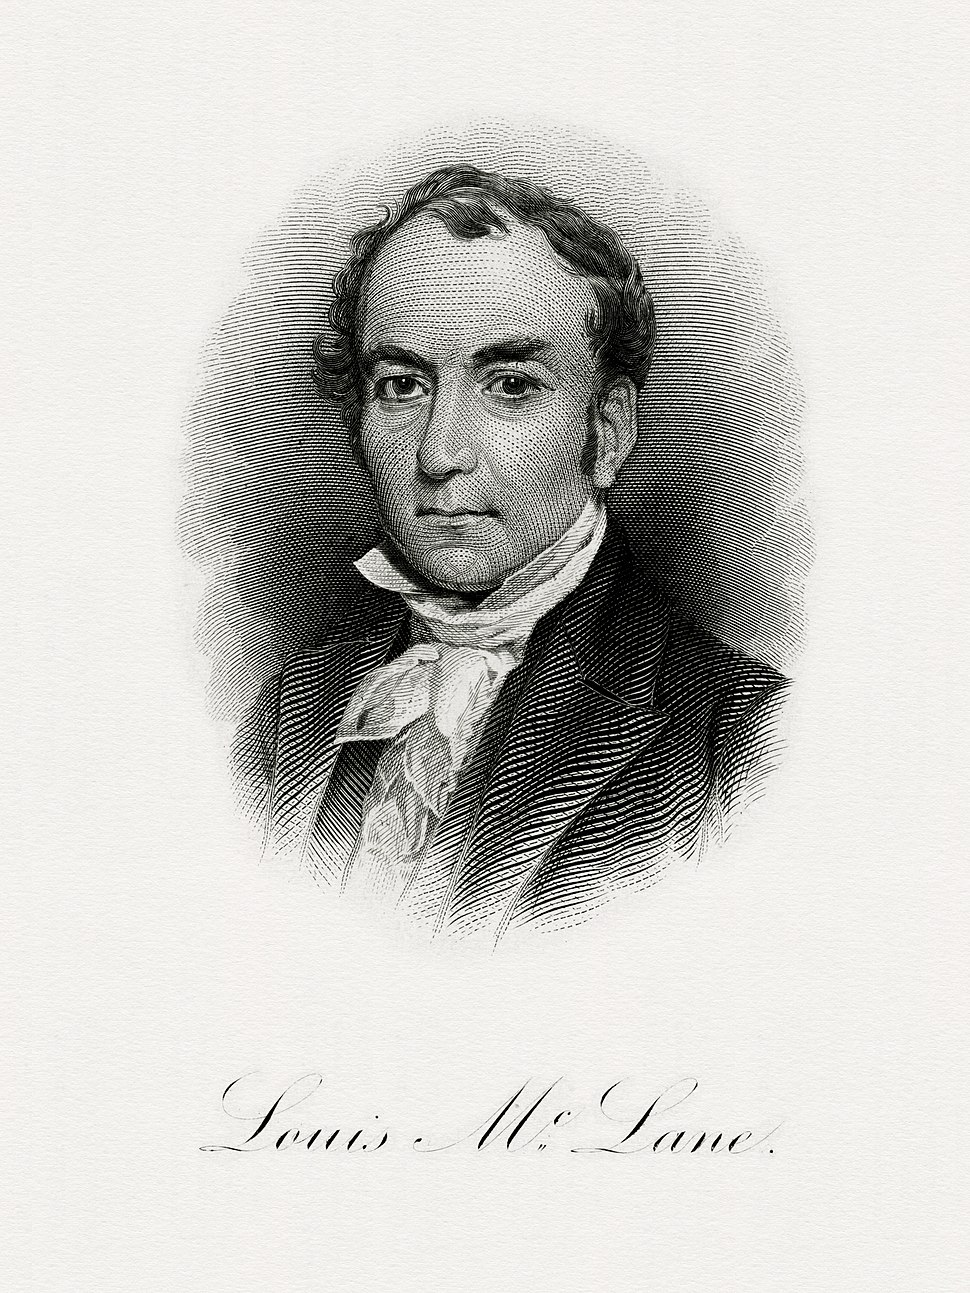 McLANE, Louis-Treasury (BEP engraved portrait)